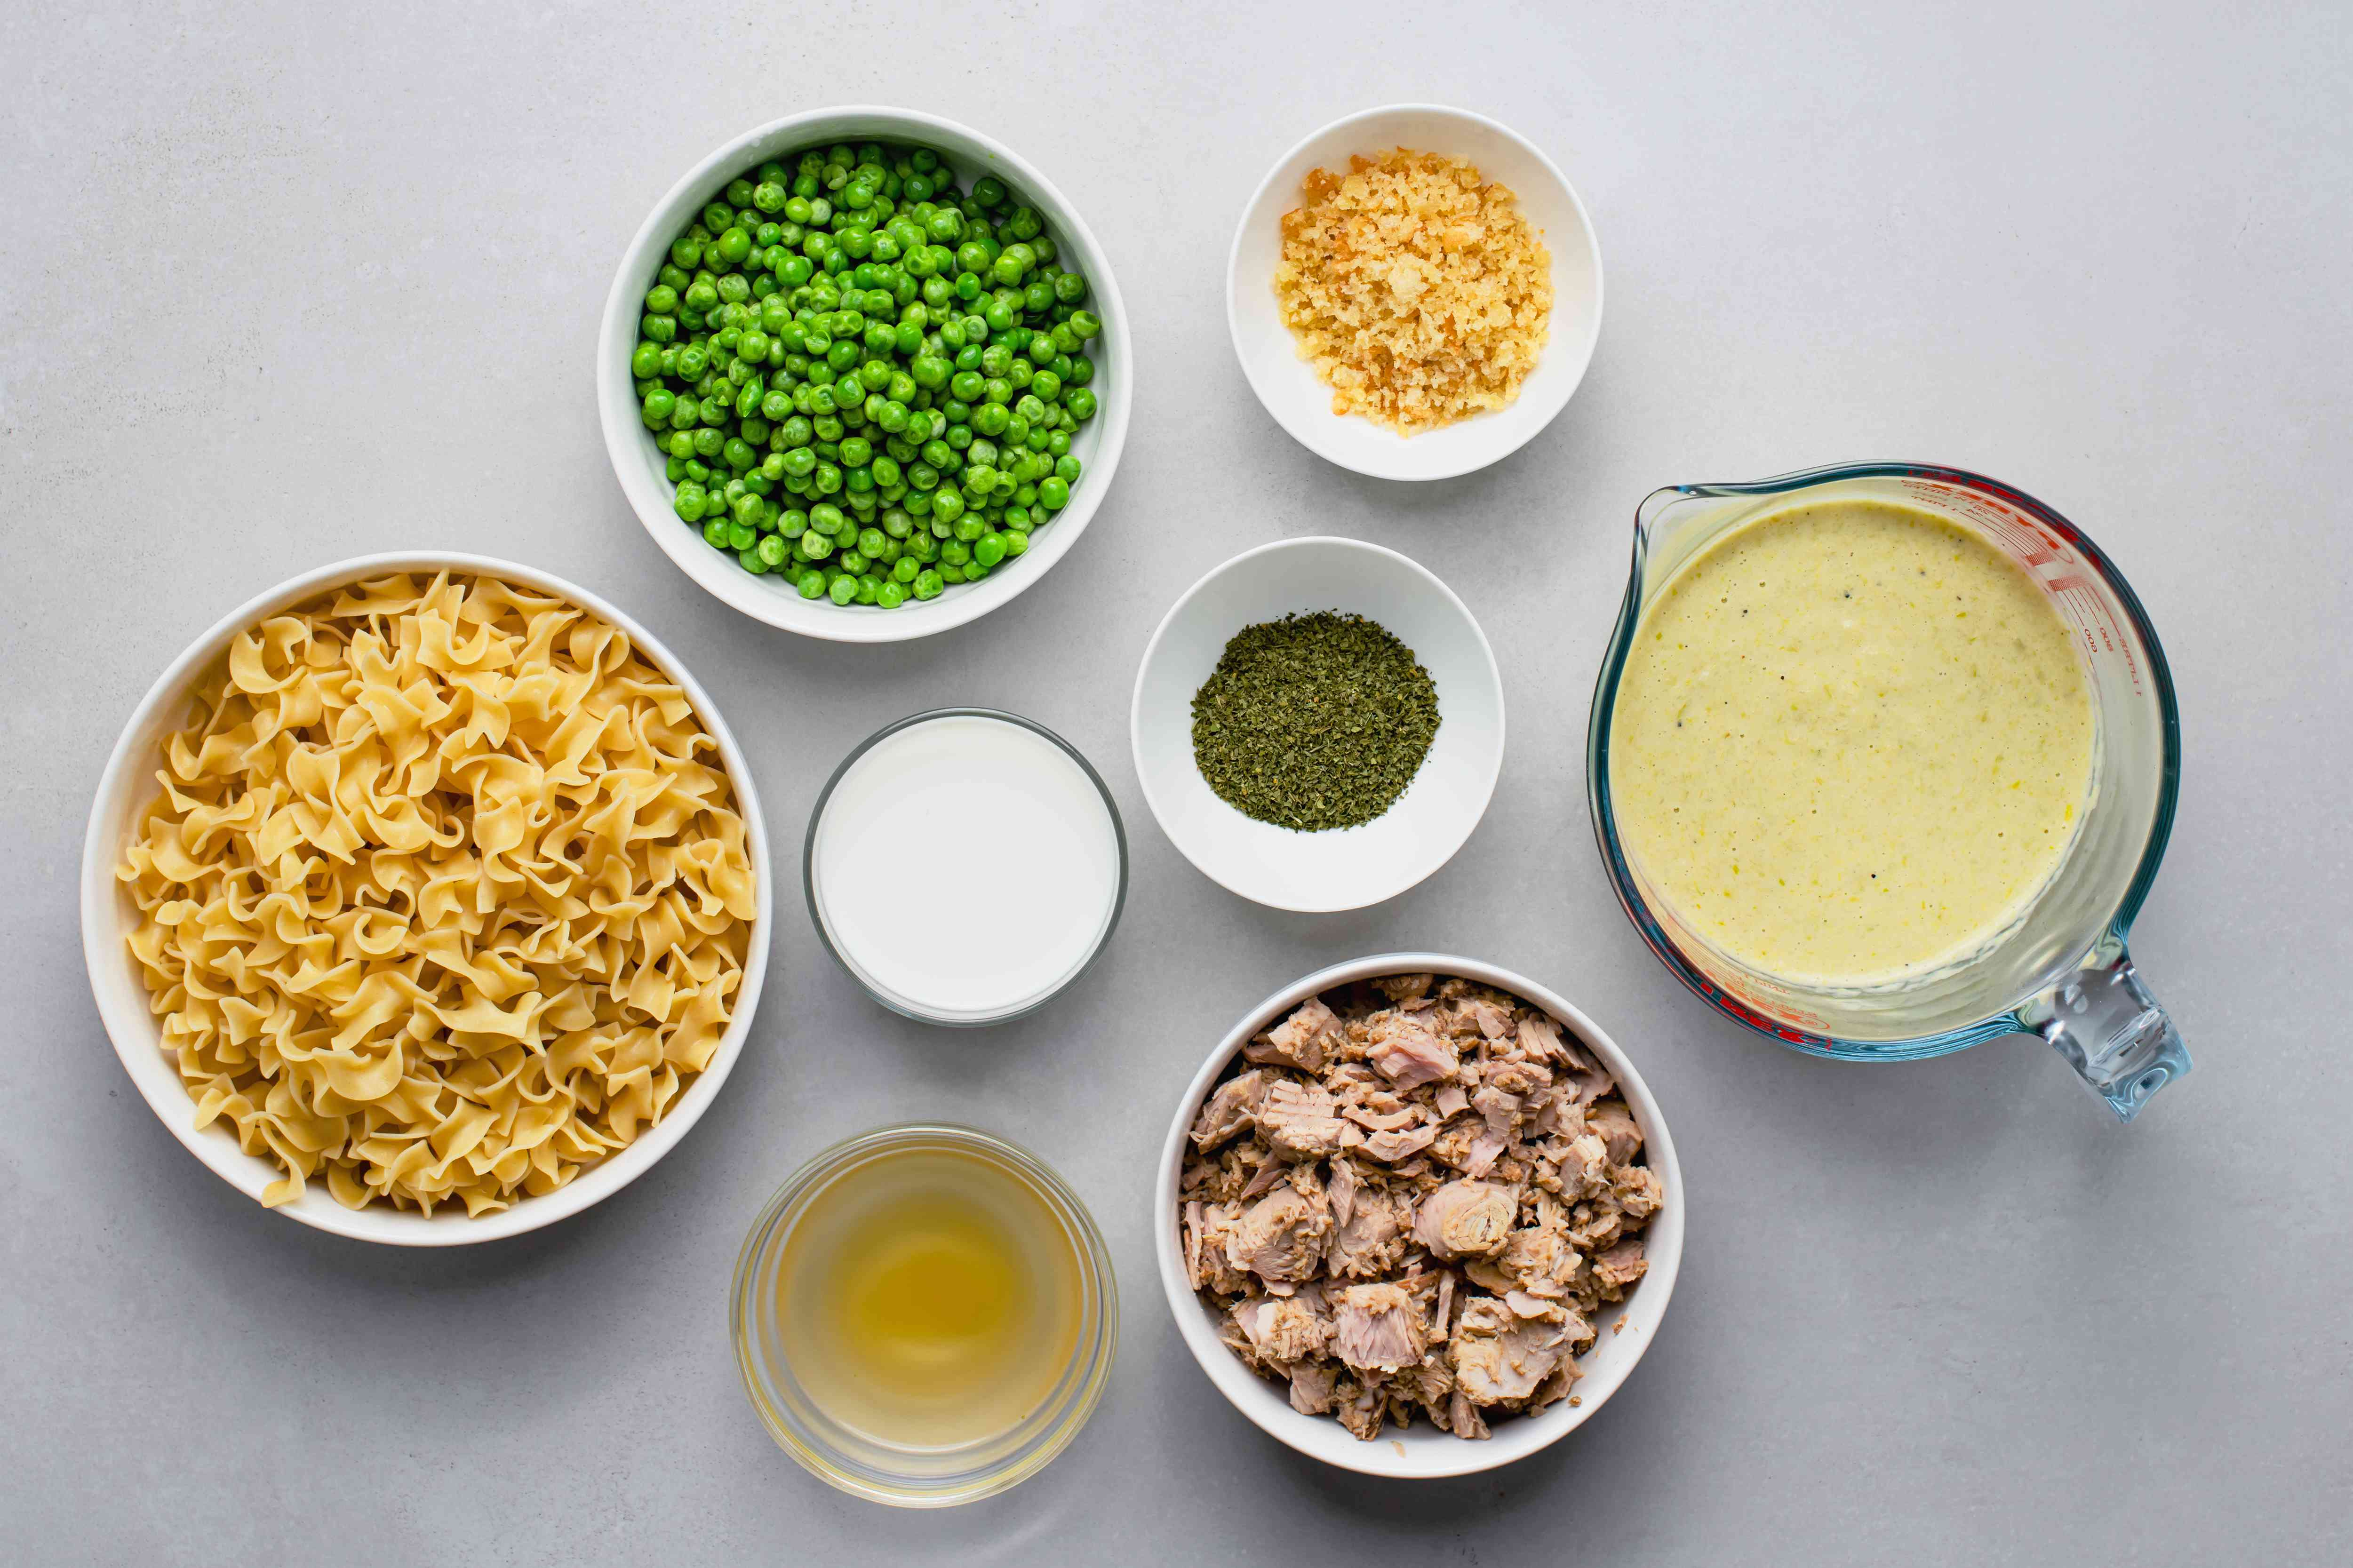 Crock Pot Tuna Casserole ingredients